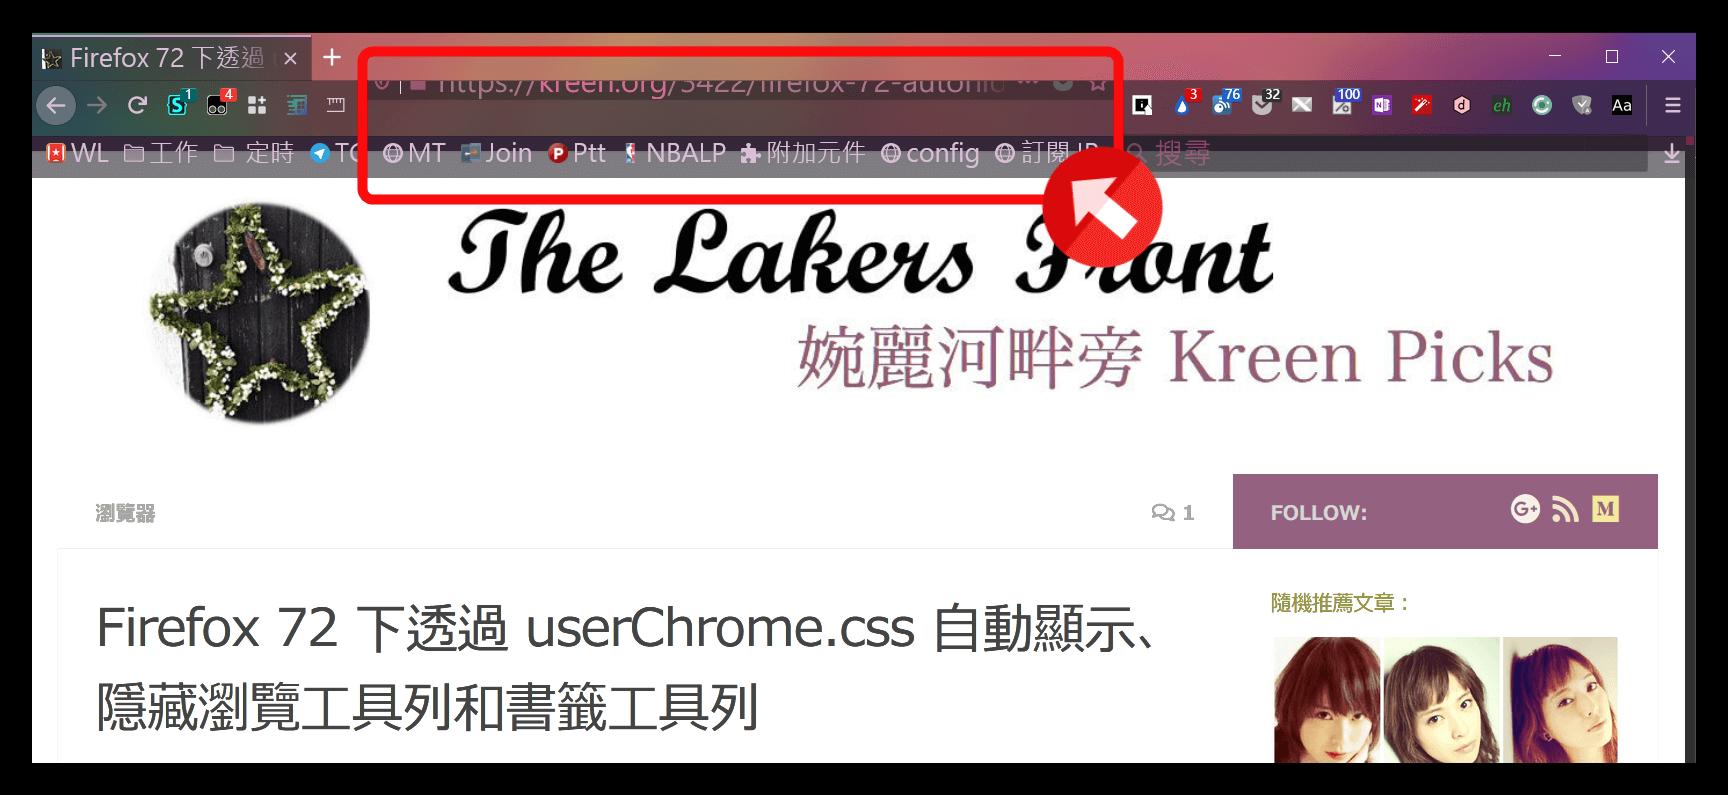 Firefox 75 新設計會造成網址列顯示出錯